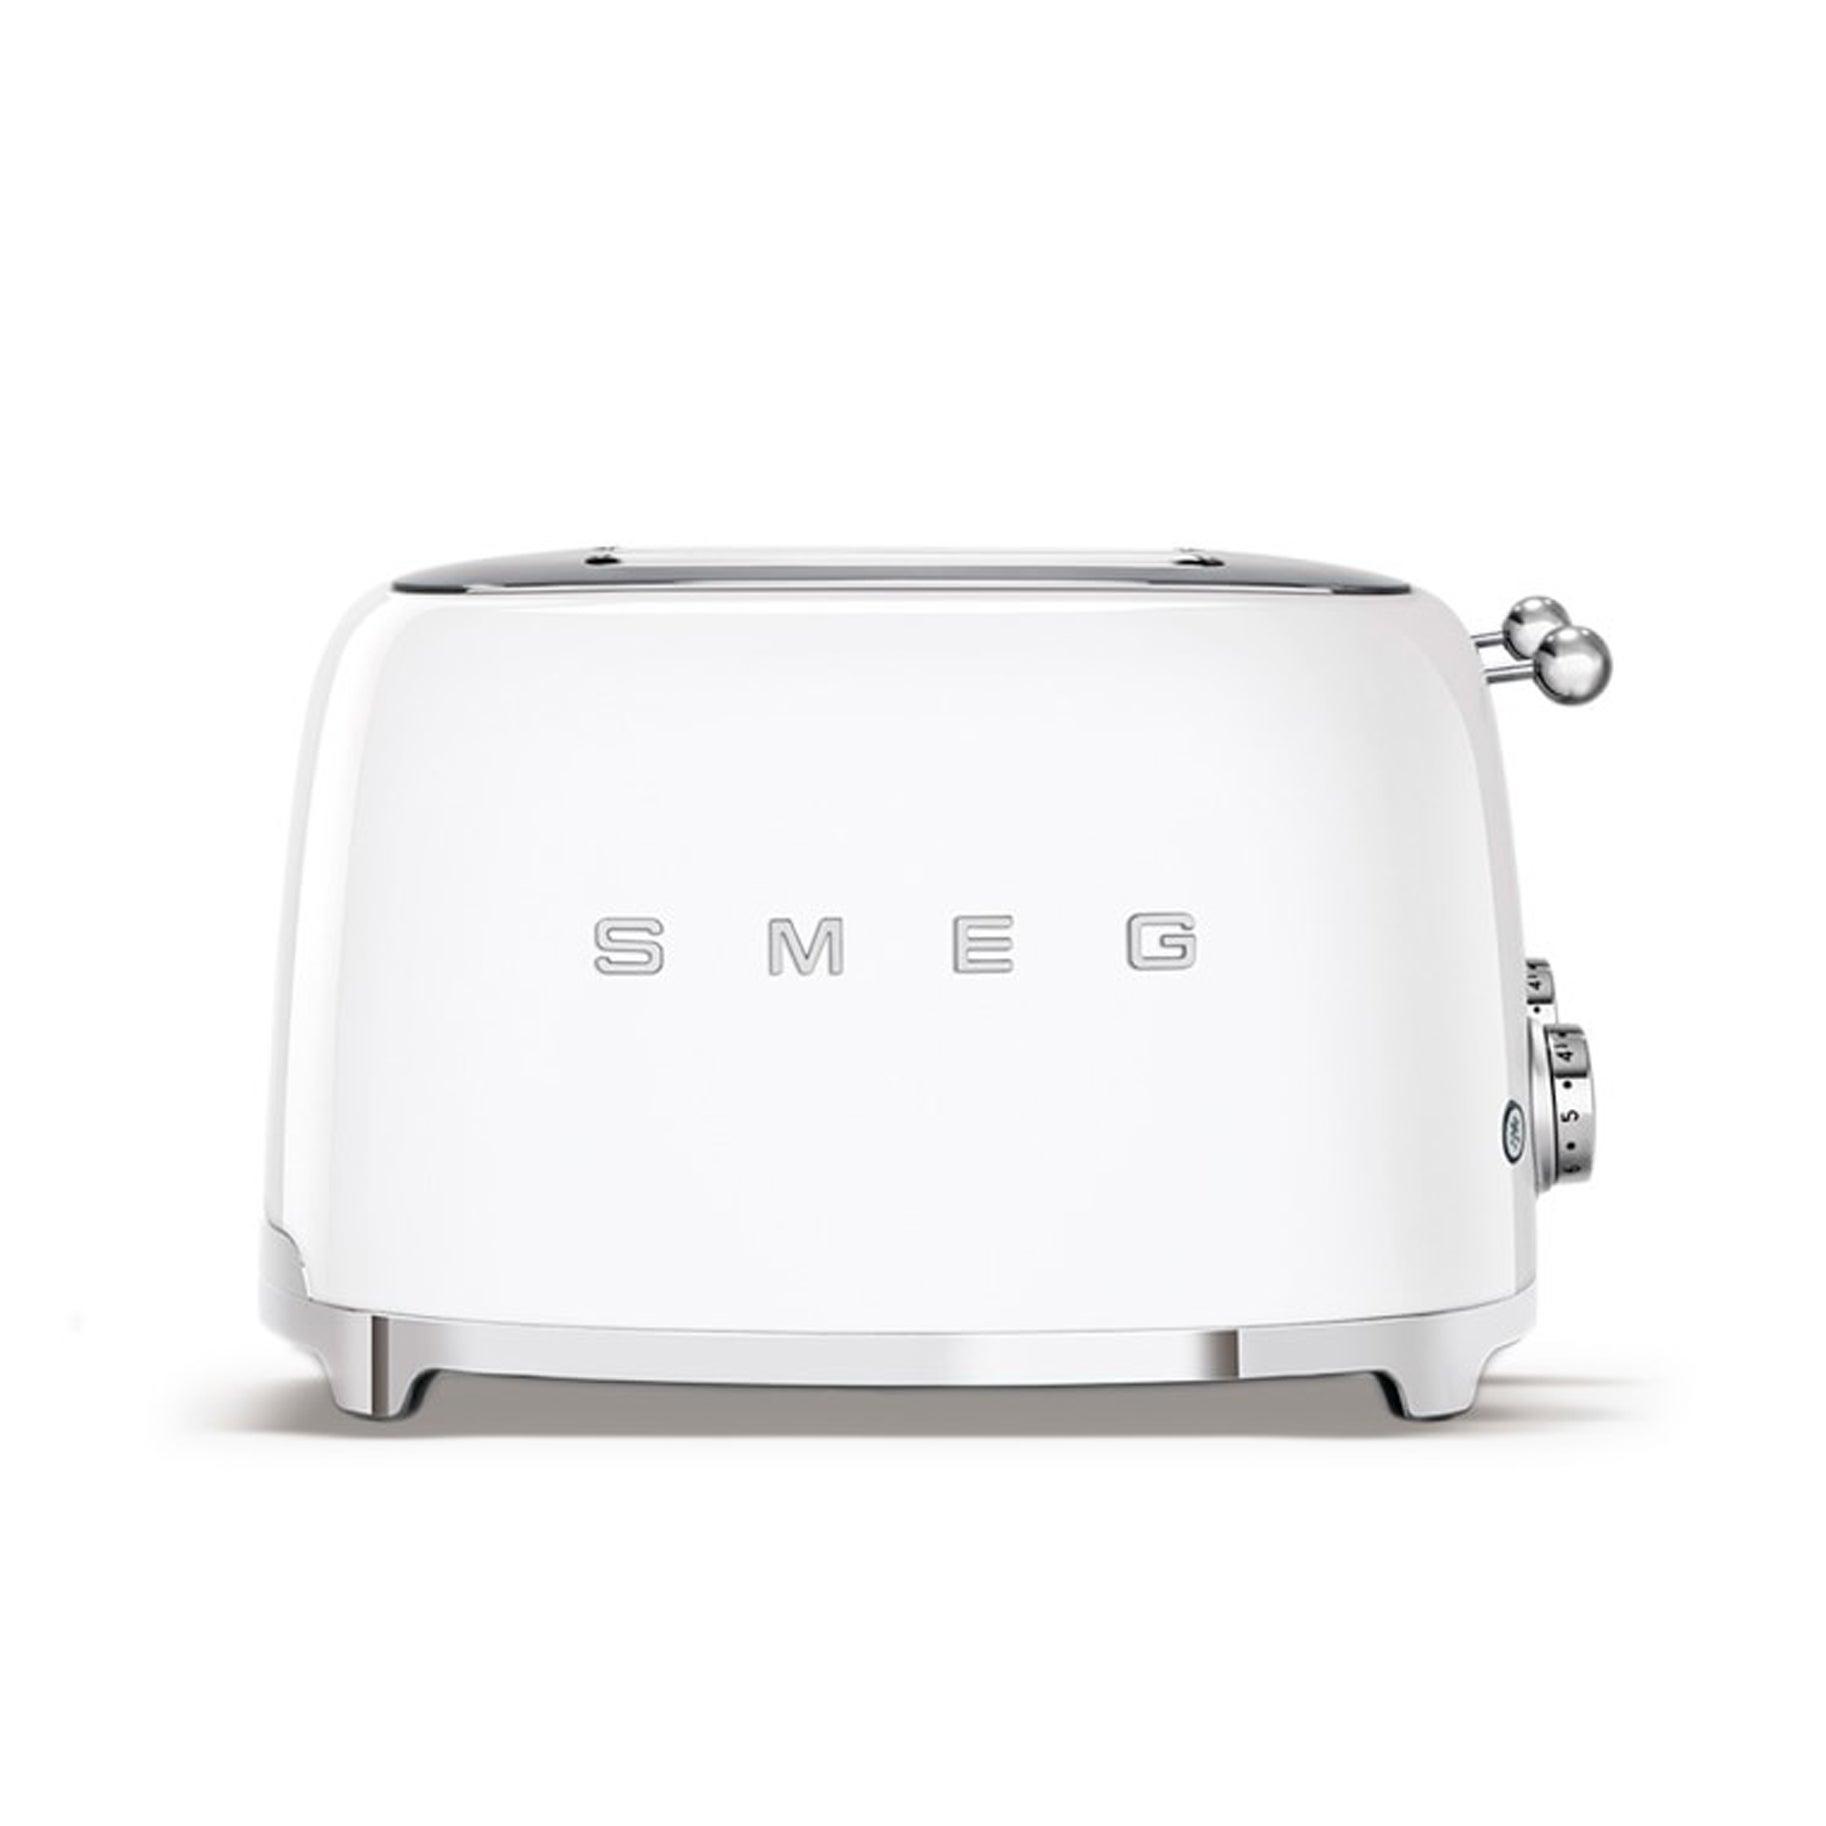 The Best Four Slice Toasters Option: SMEG Four Slot Toaster